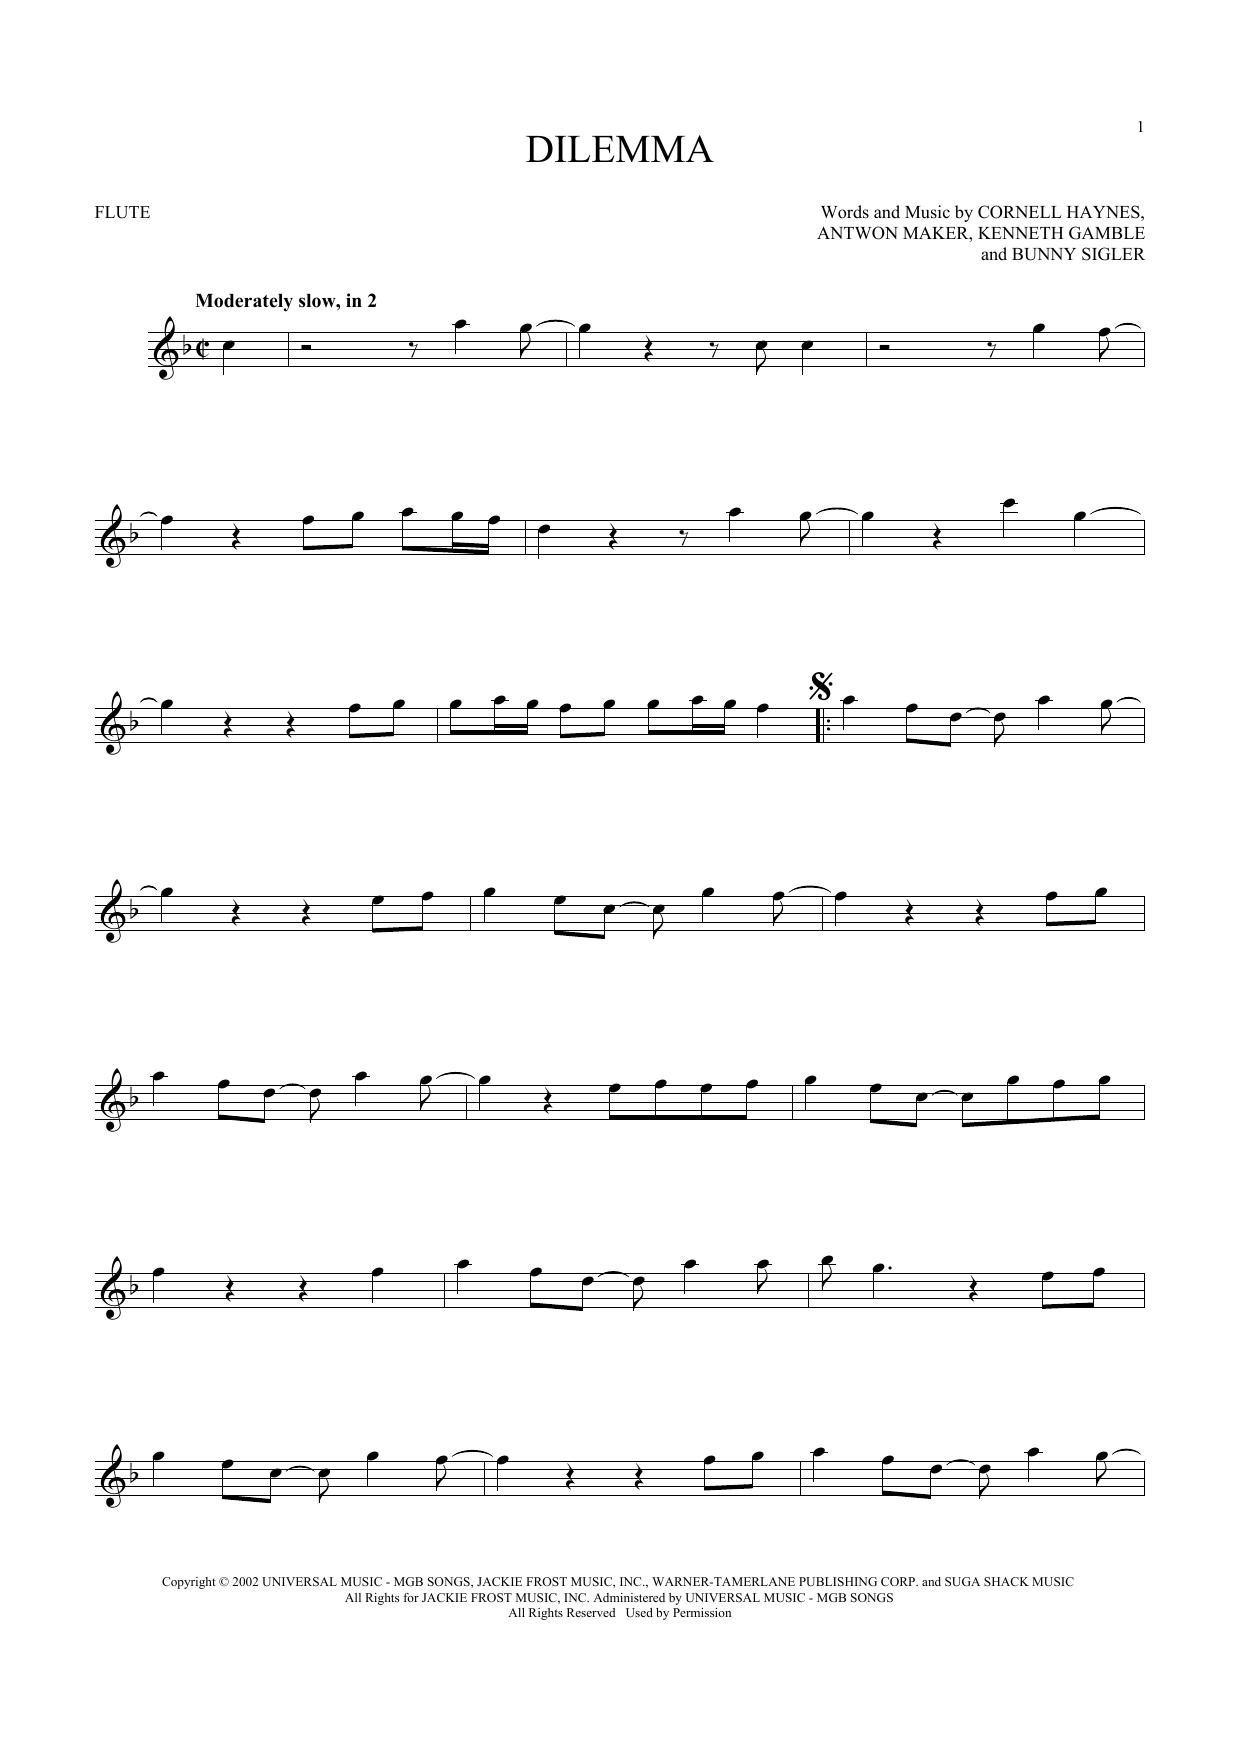 Dilemma (Flute Solo)